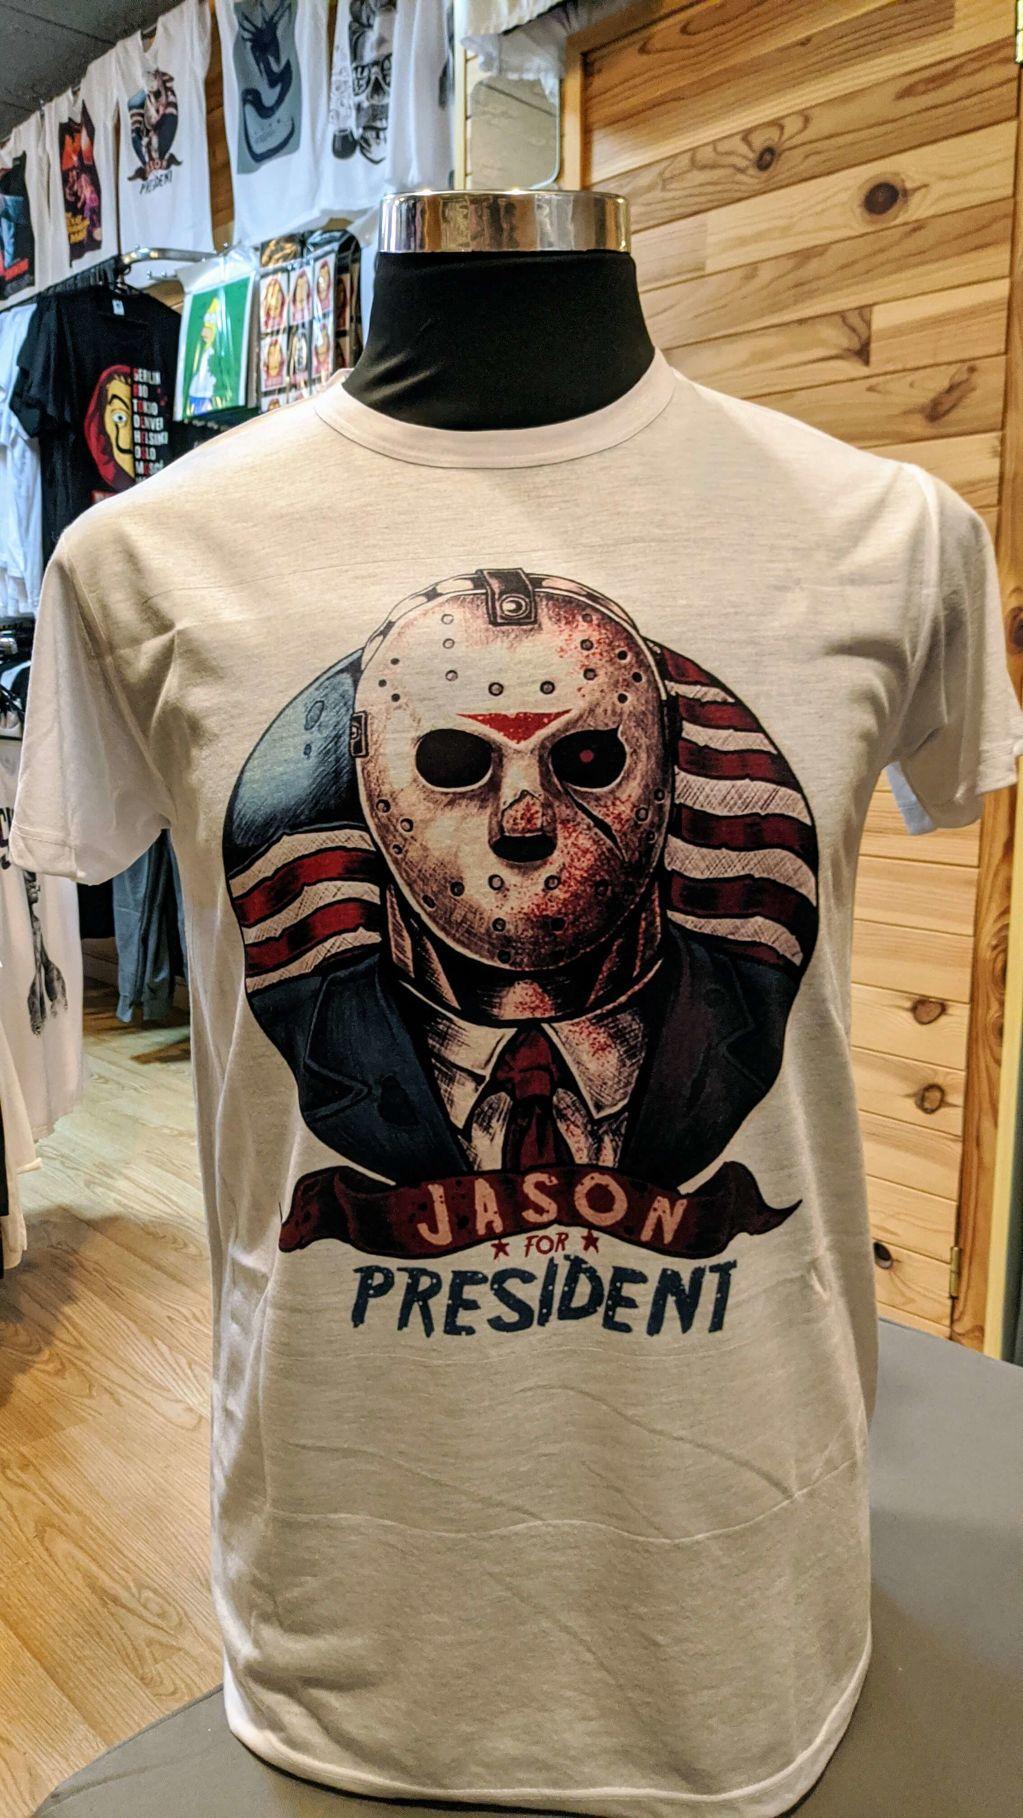 Jason for president - 56cb2-camiseta-viernes-13.jpg